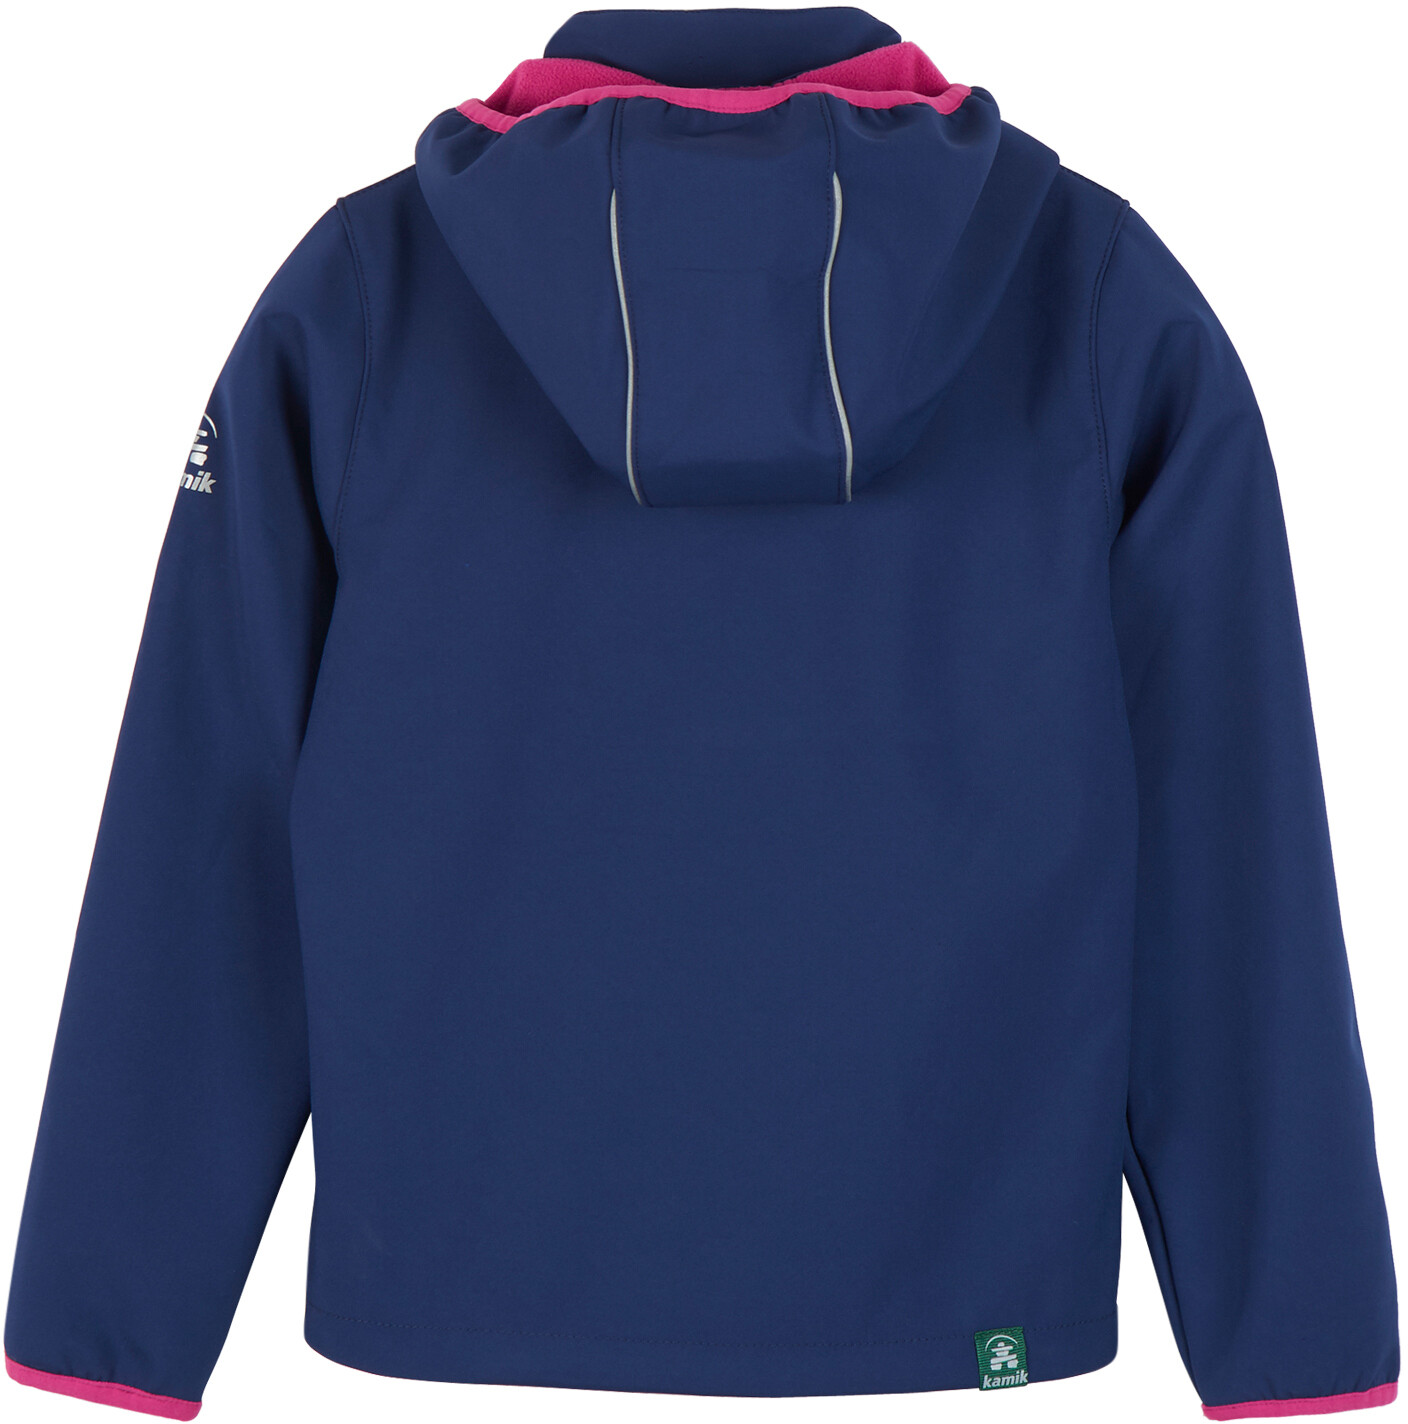 Icepeak Lamesa Softshelljakke Børn, pink | Find outdoortøj